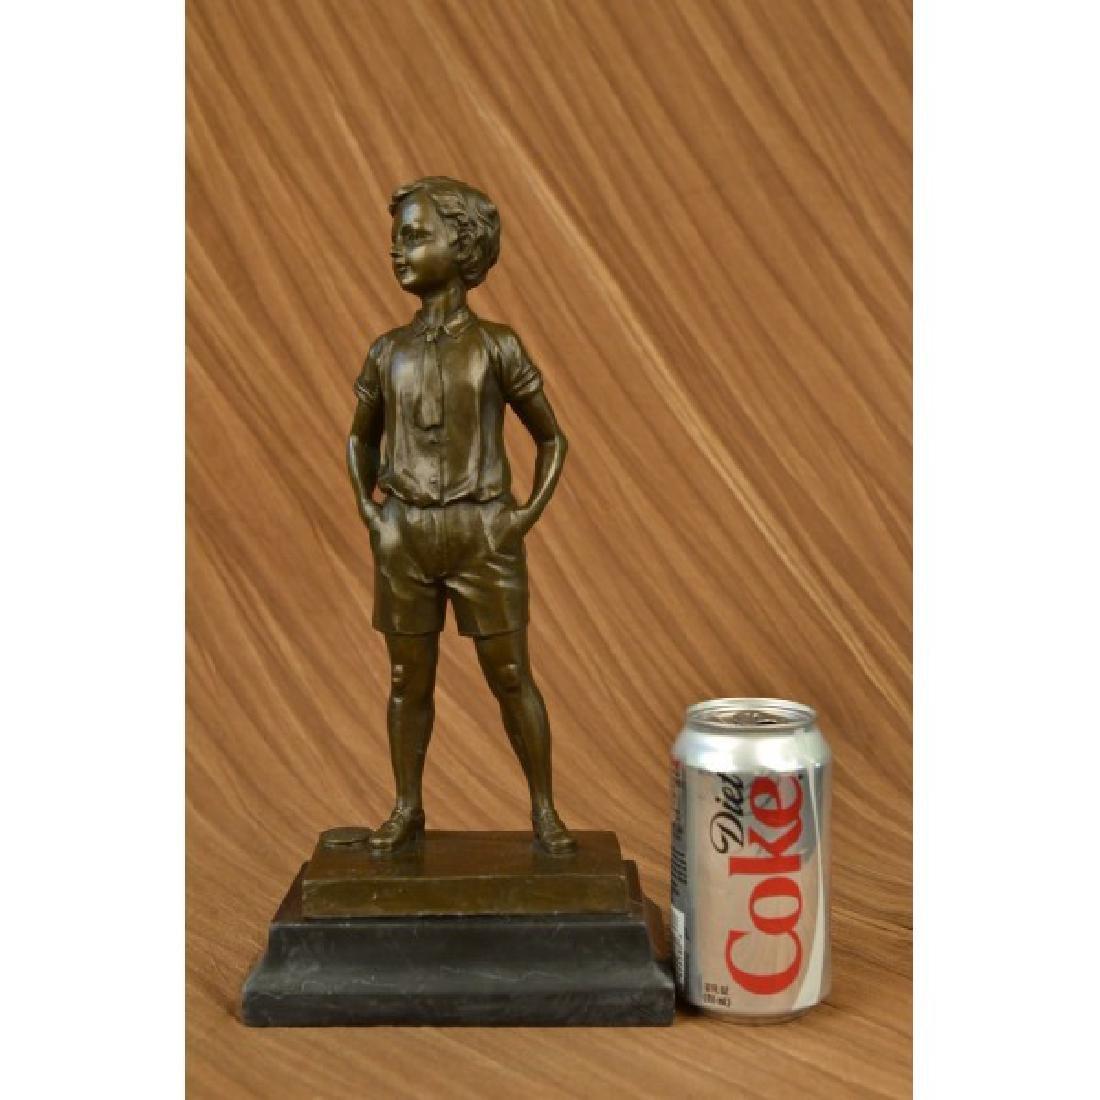 Preiss Young Boy School Boy Bow Tie Bronze Sculpture